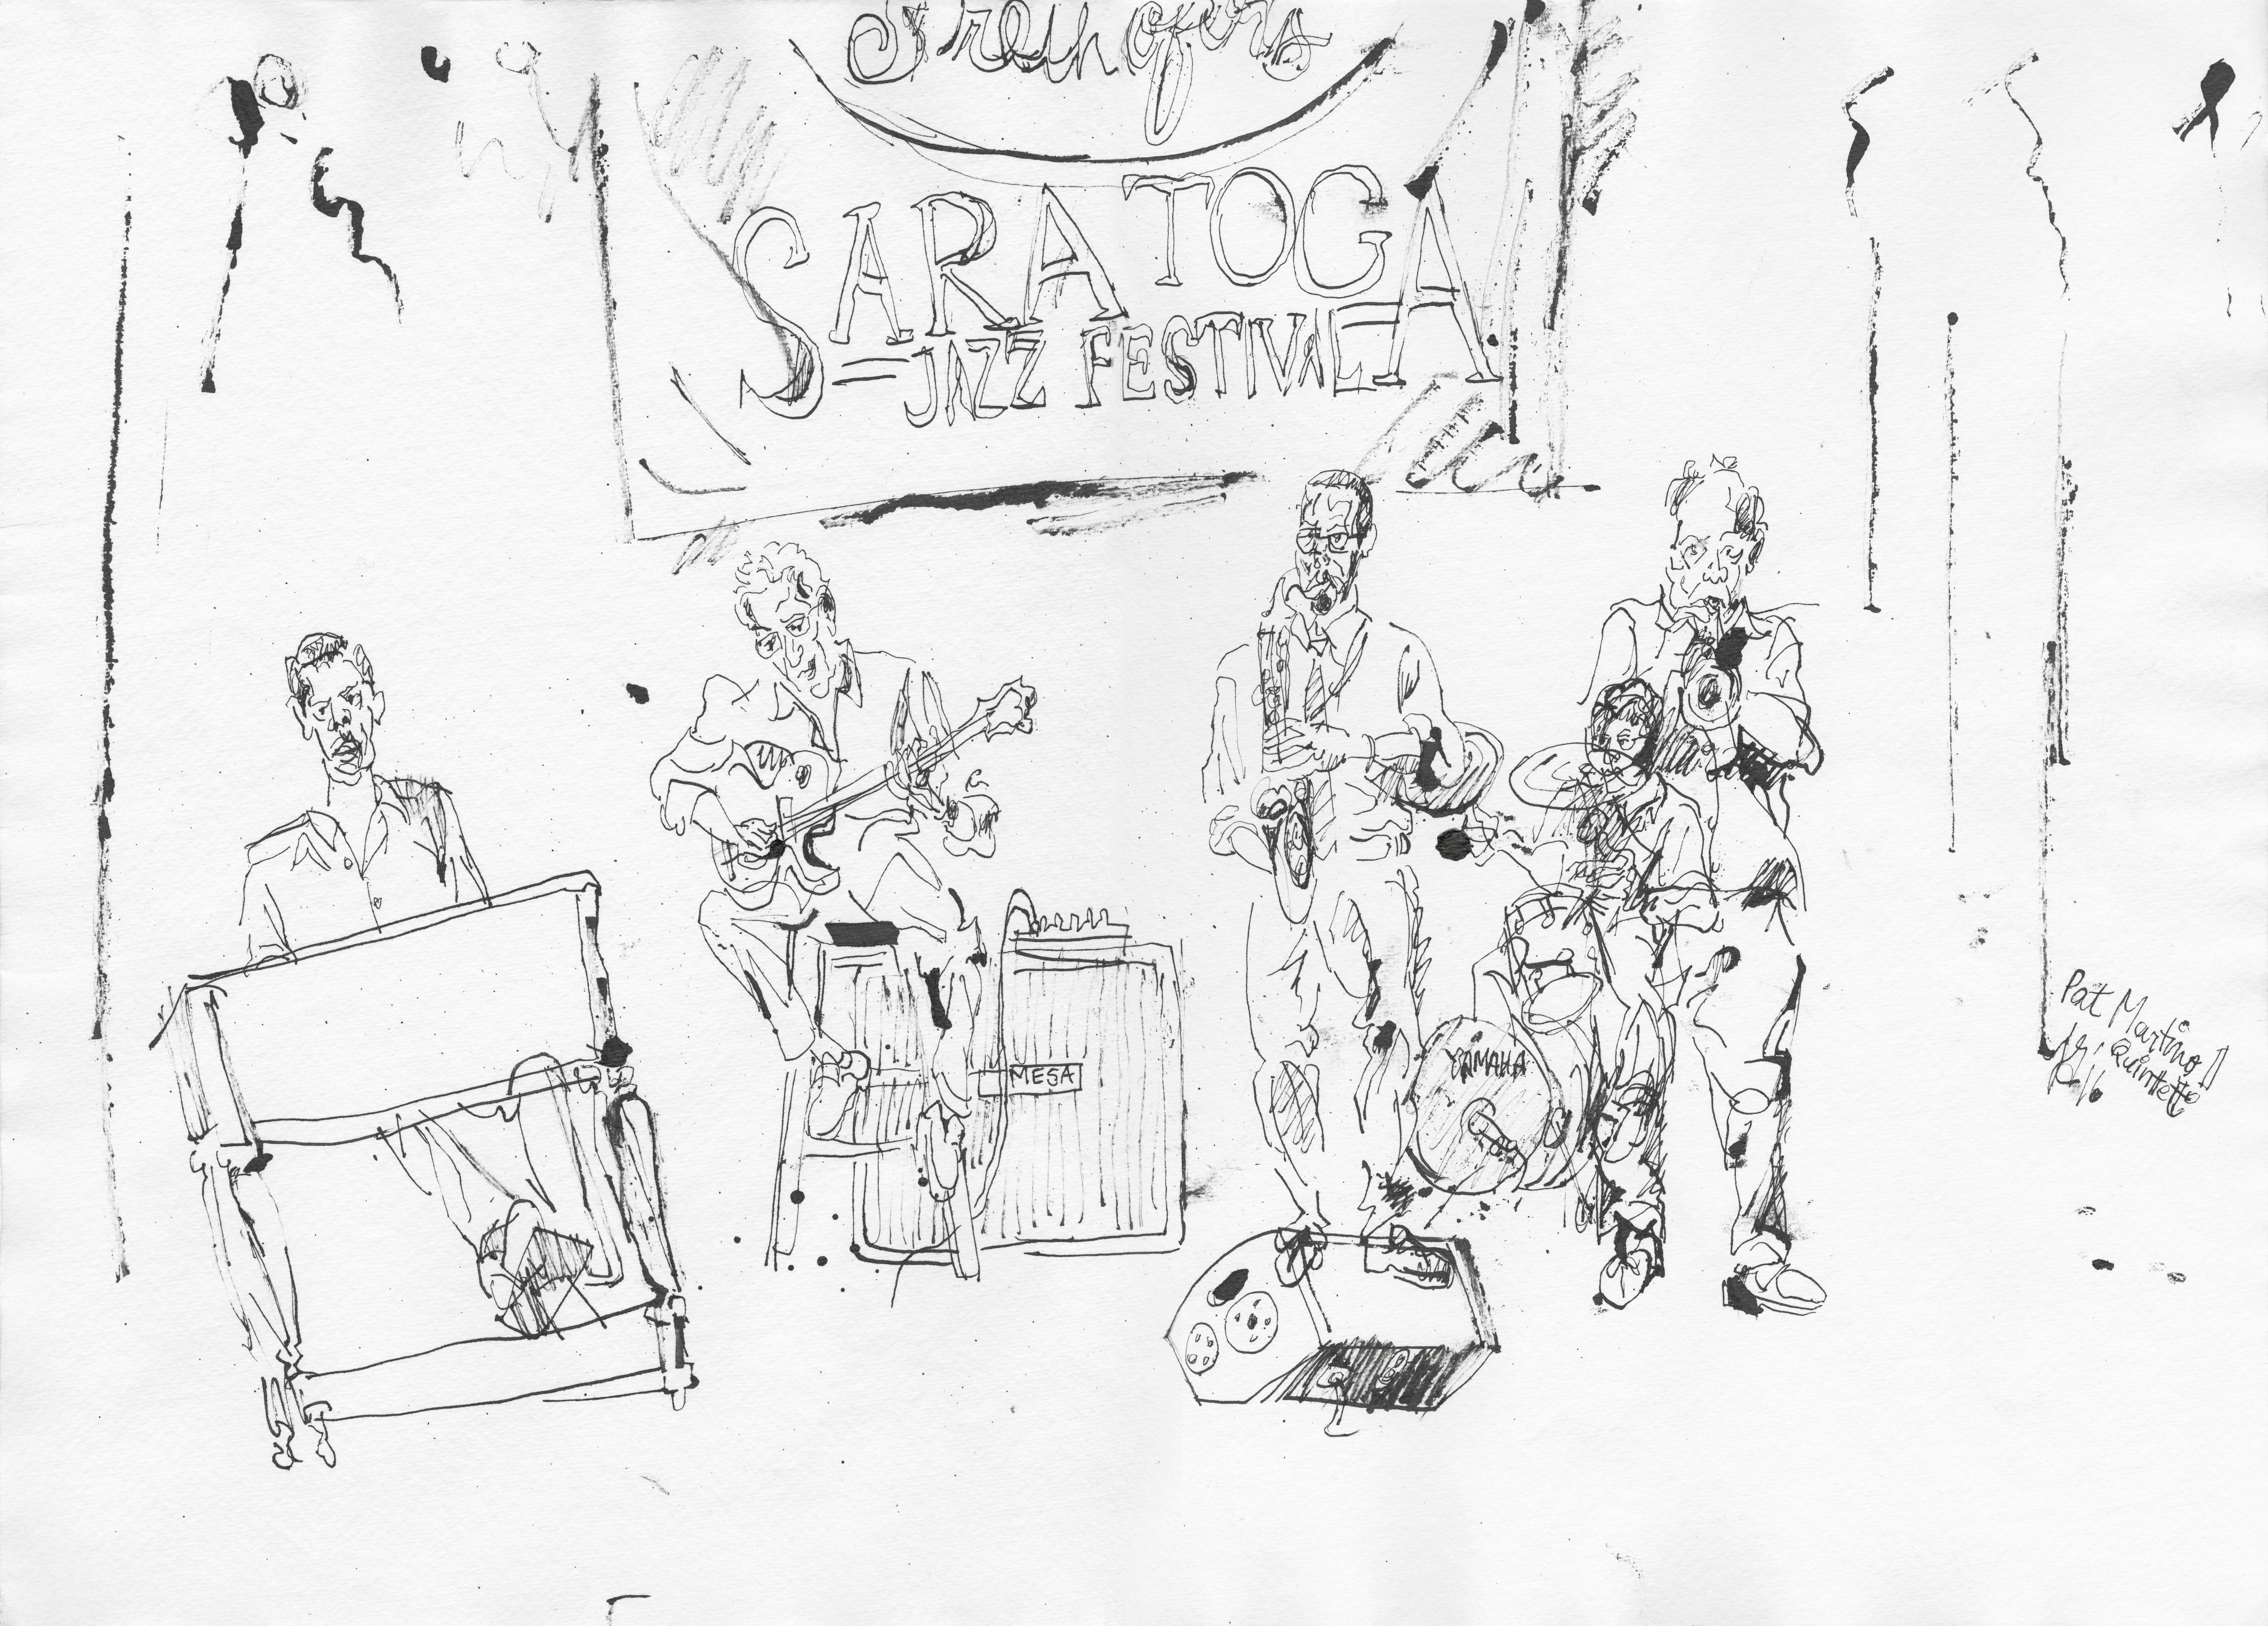 Pat Martino Quintet - Ink on Paper - Original Contemporary Sketch